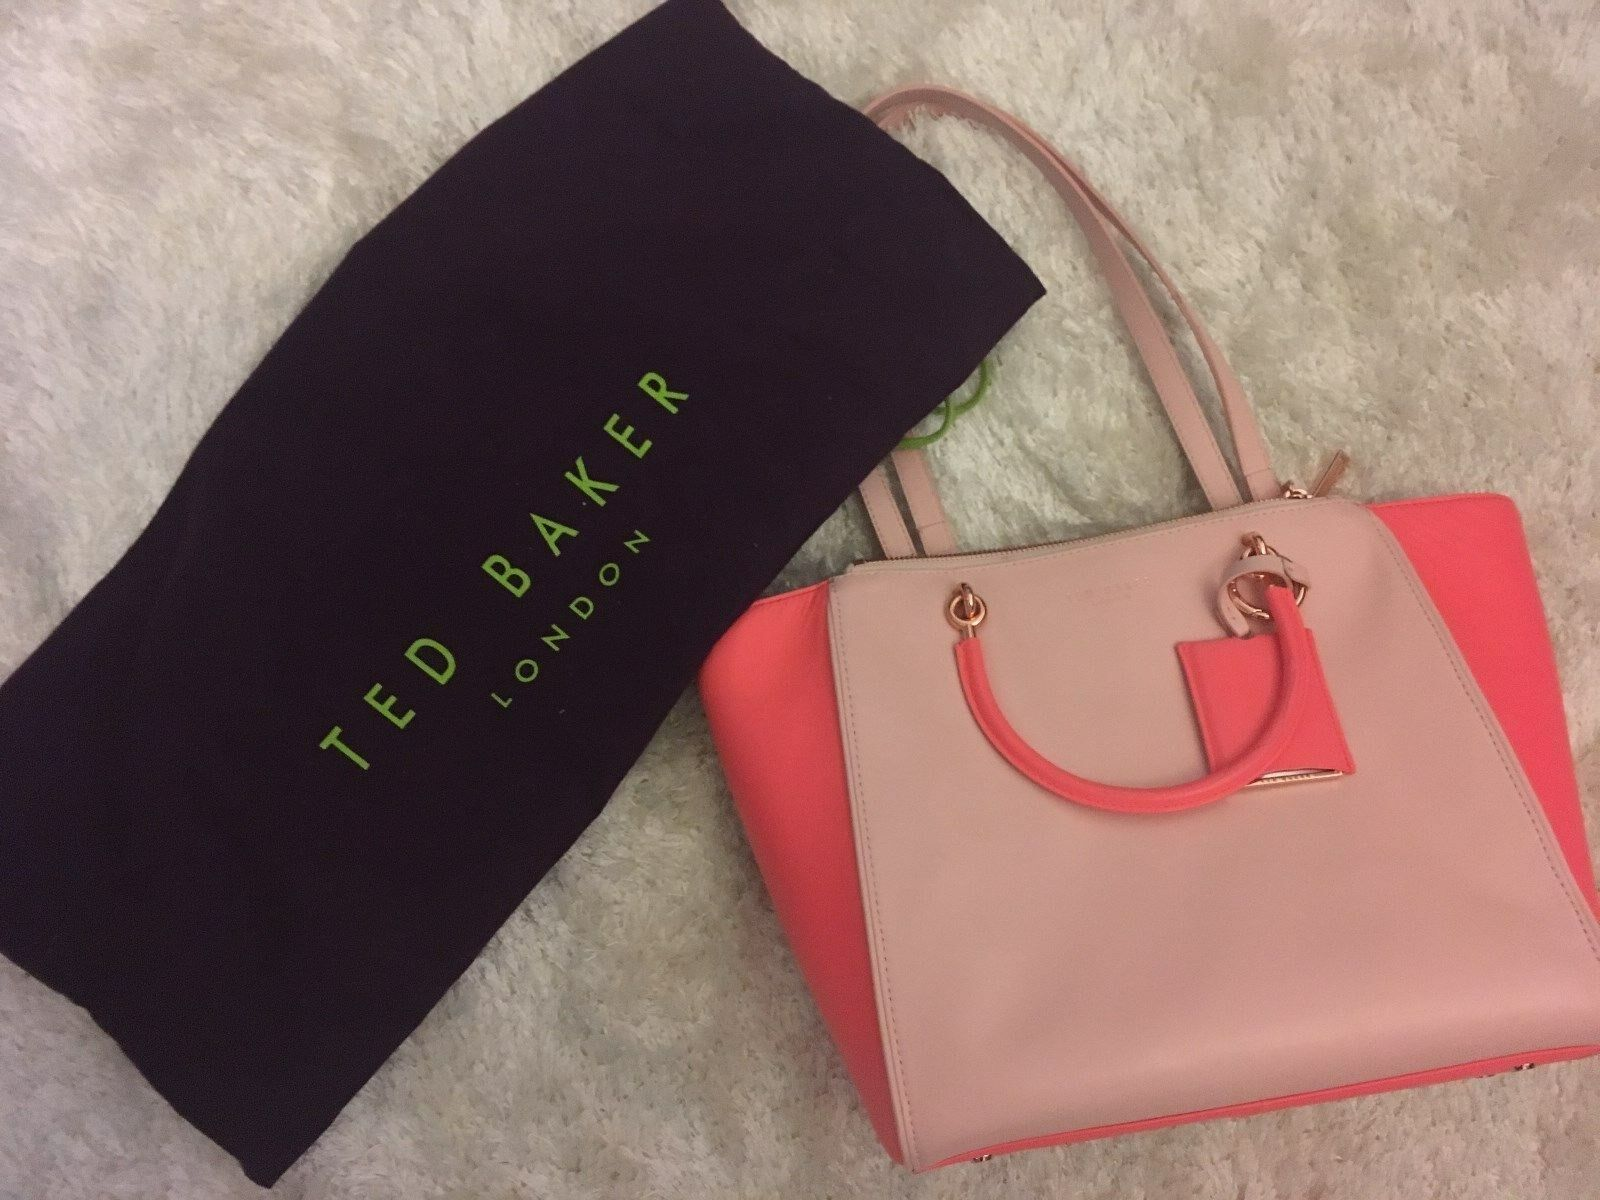 Ted Baker Tasche  Rosa/Pink Shopper, Shoppingbag, Handtasche, Fashion, Lifestyle